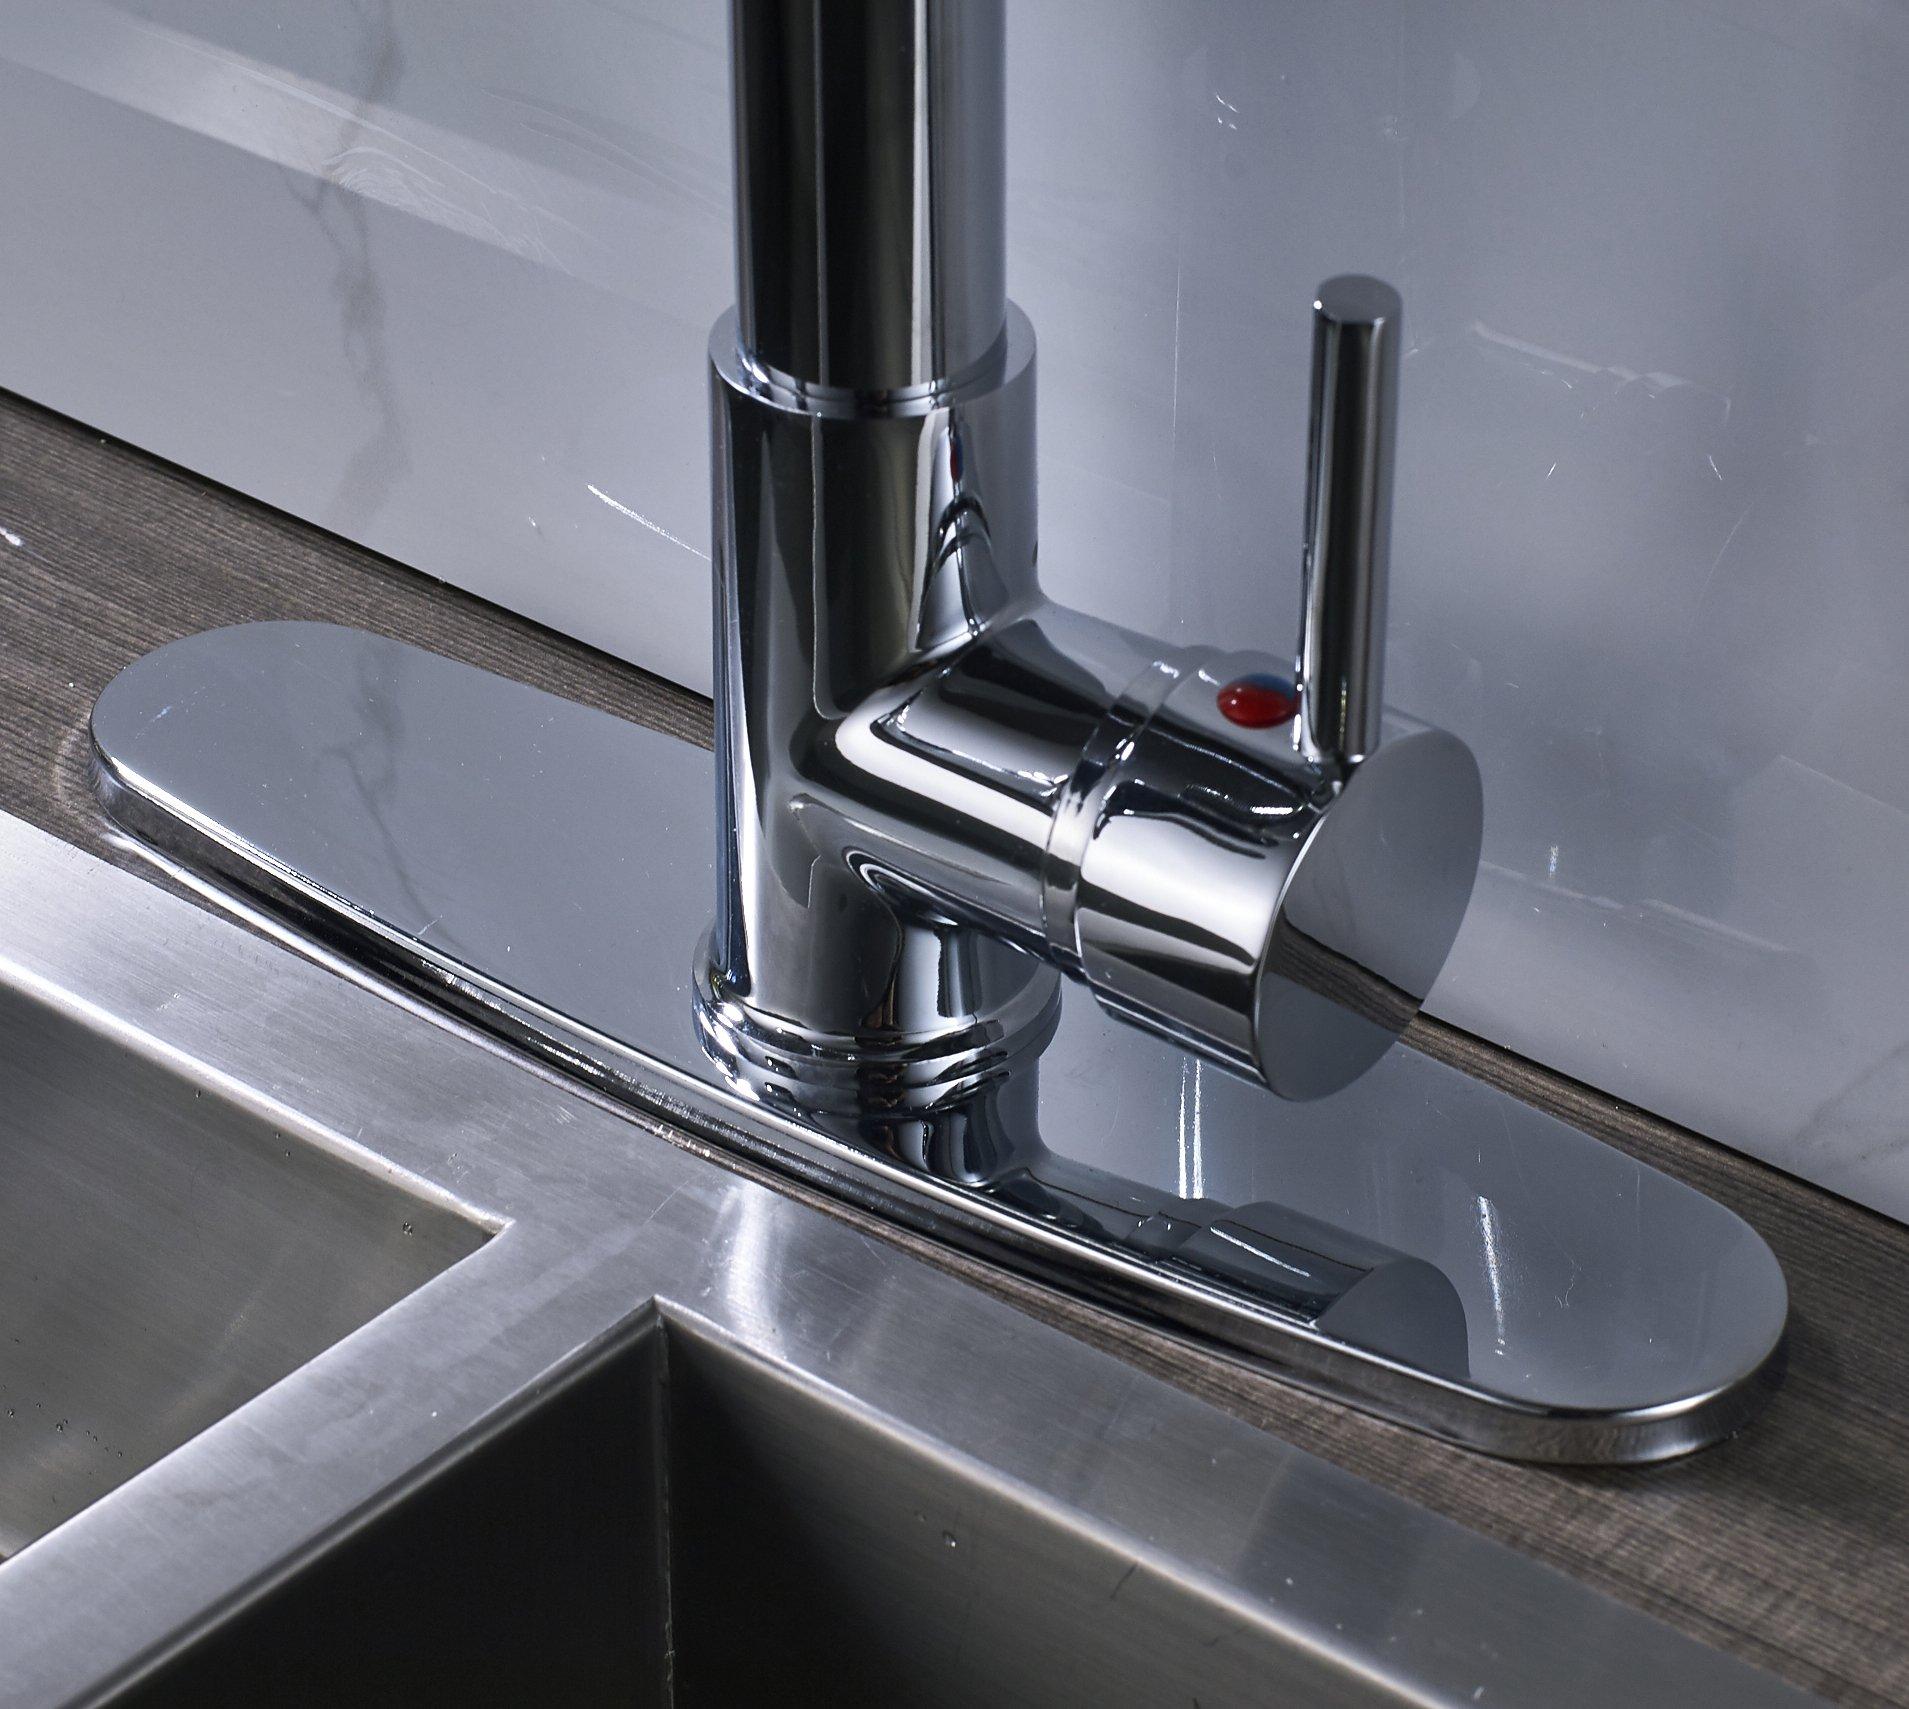 Rozin Chrome Finish LED Light Sprayer Kitchen Sink Faucet Spring Swivel Spout Mixer Tap by Rozin (Image #4)